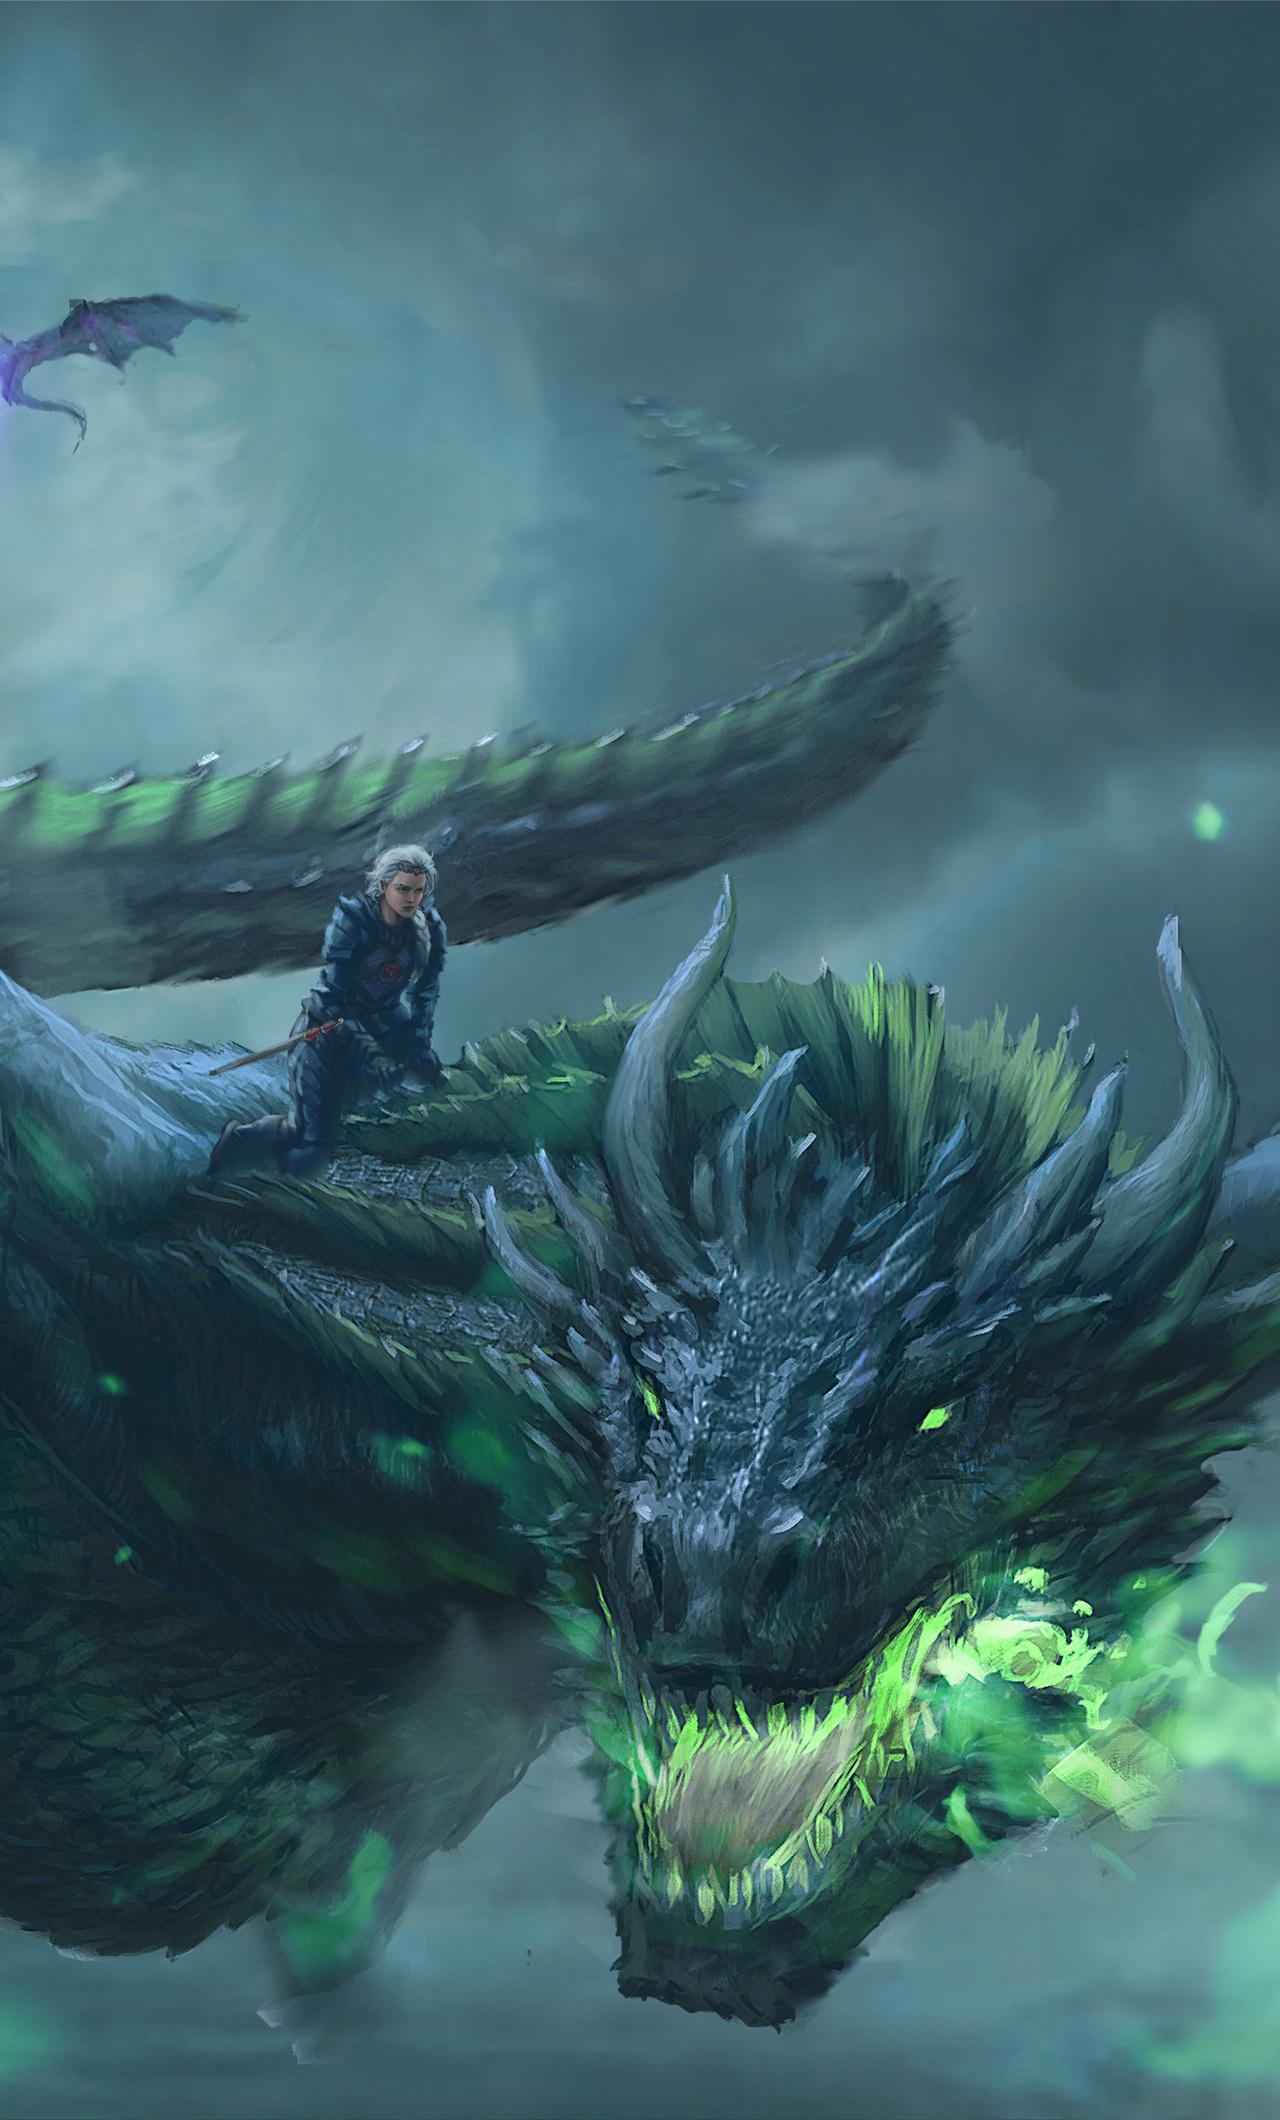 1280x2120 Daenerys Targaryen Dragon Digital Art 4k Iphone 6